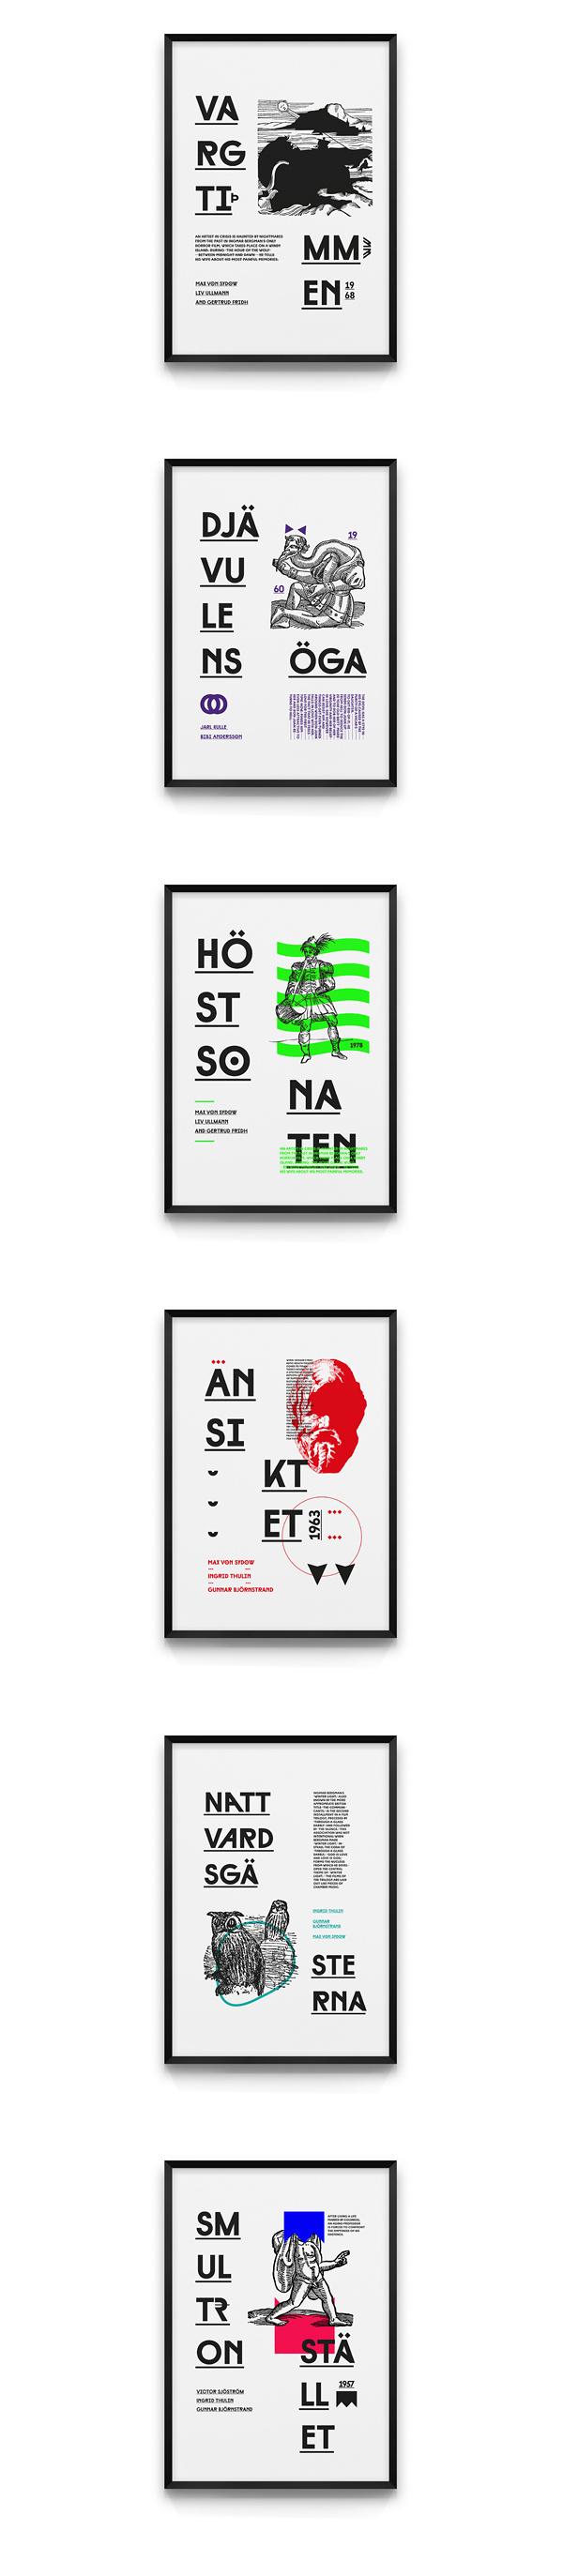 Bergman | Film Posters on Behance #poster #film